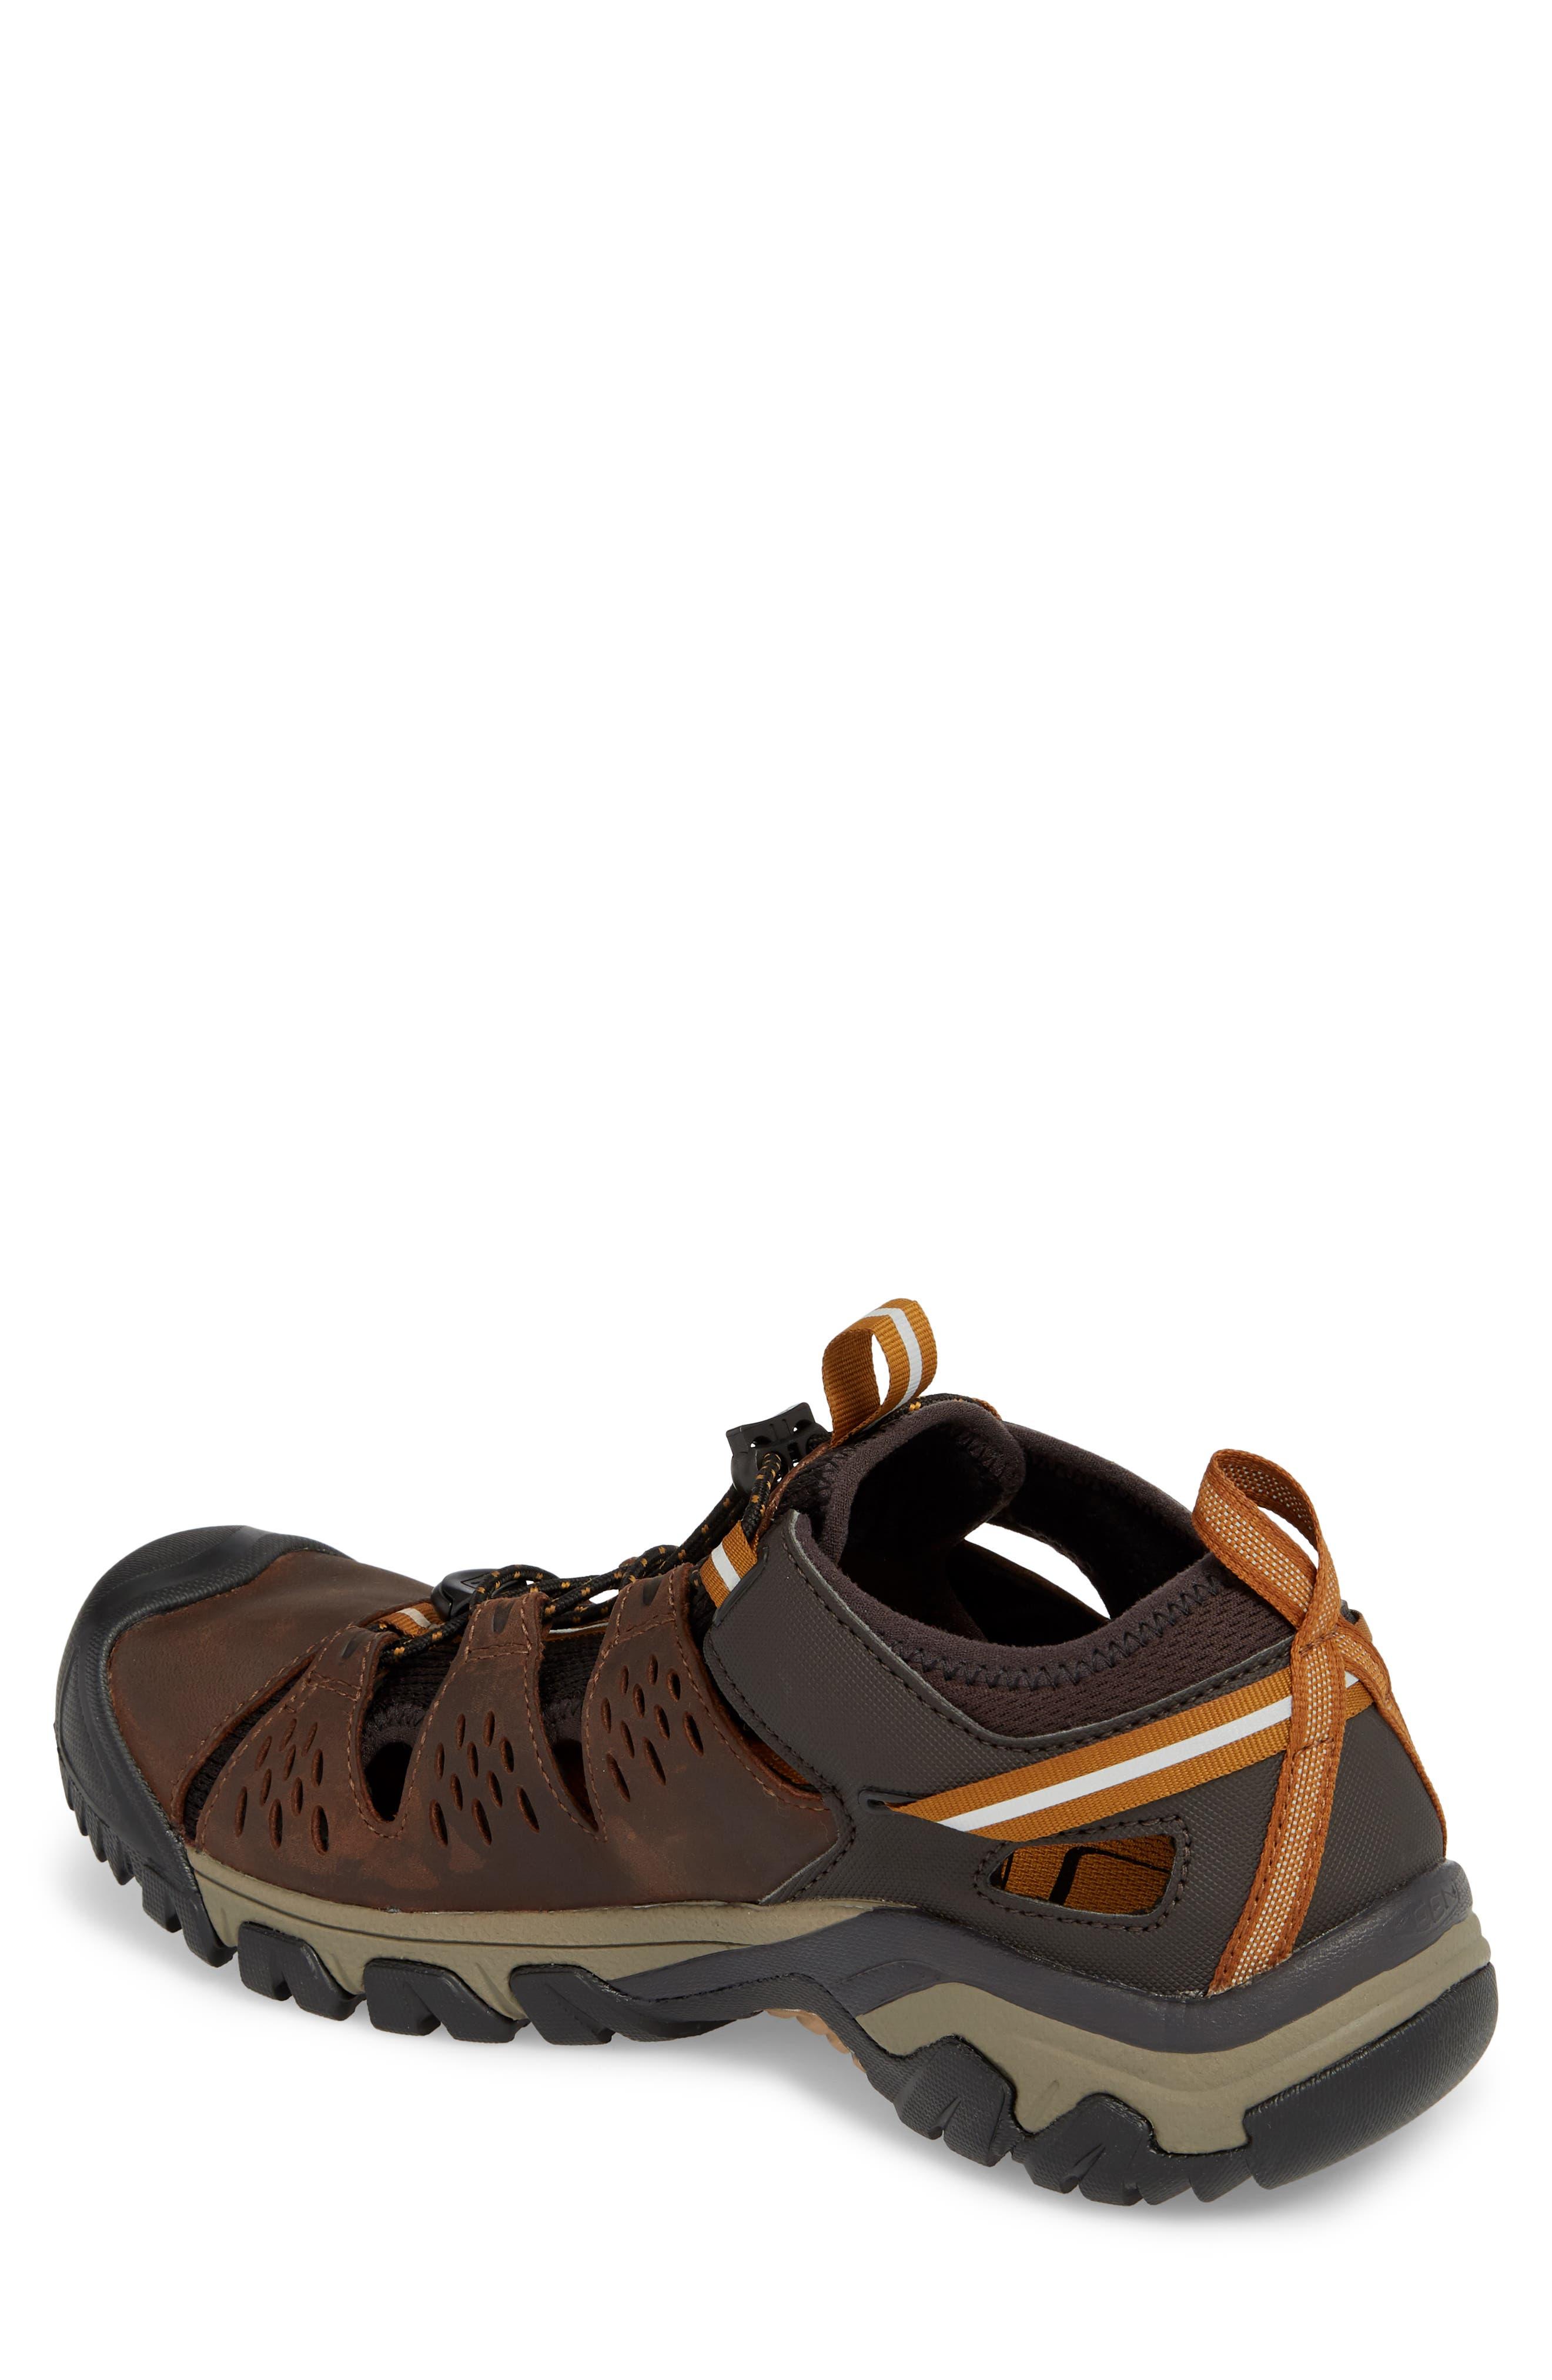 Arroyo III Hiking Sandal,                             Alternate thumbnail 2, color,                             CUBAN/GOLDEN BROWN